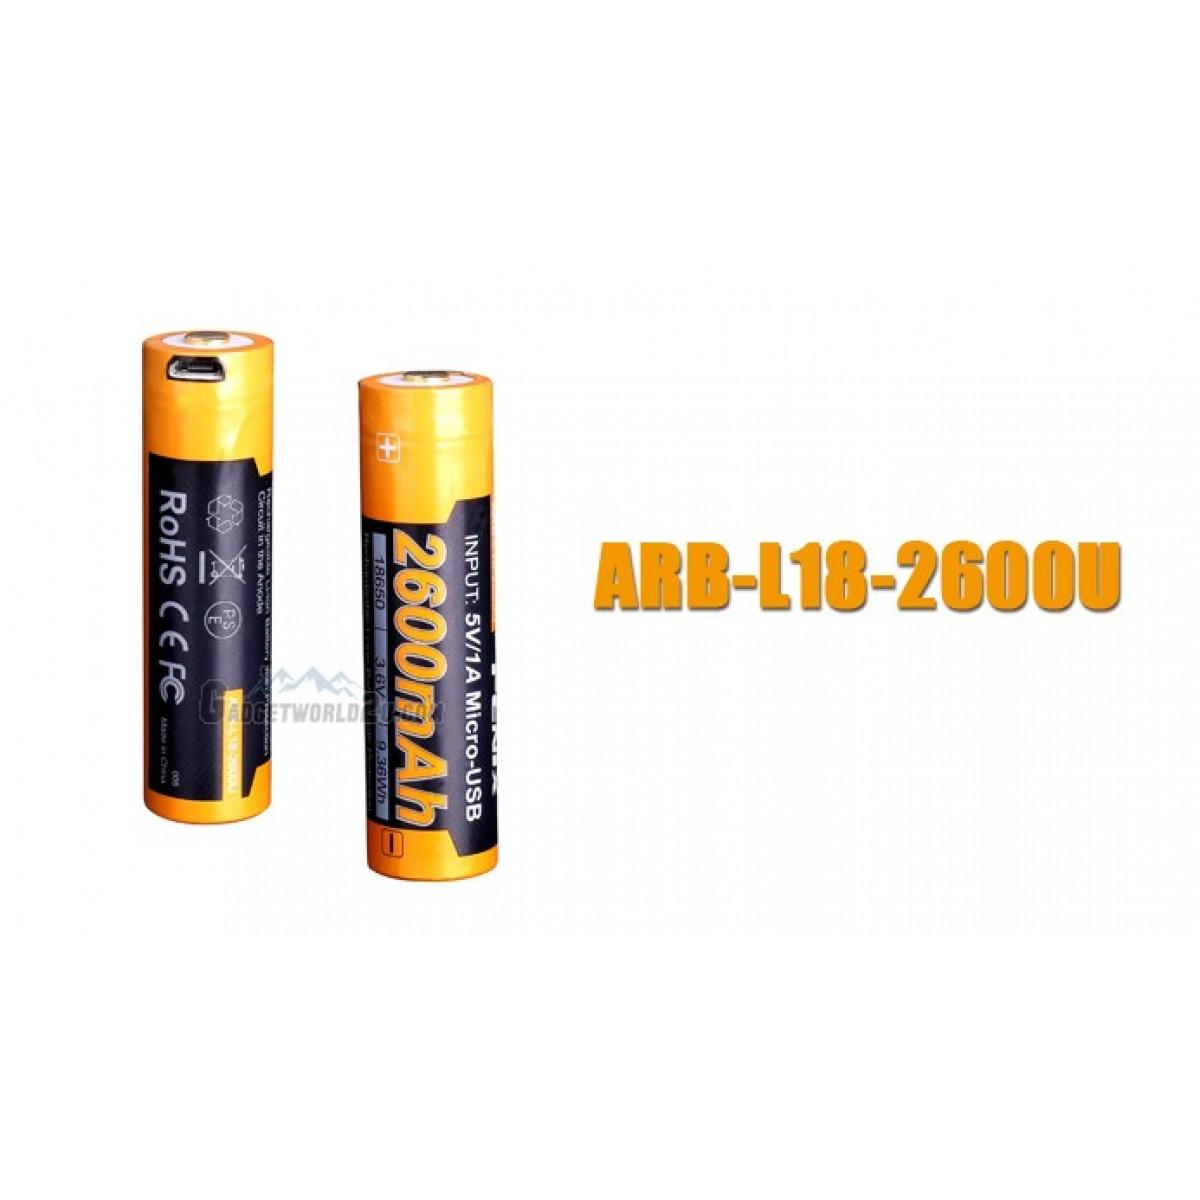 Fenix 18650 3 6v 2600mah Micro Usb Li Ion Rechargeable